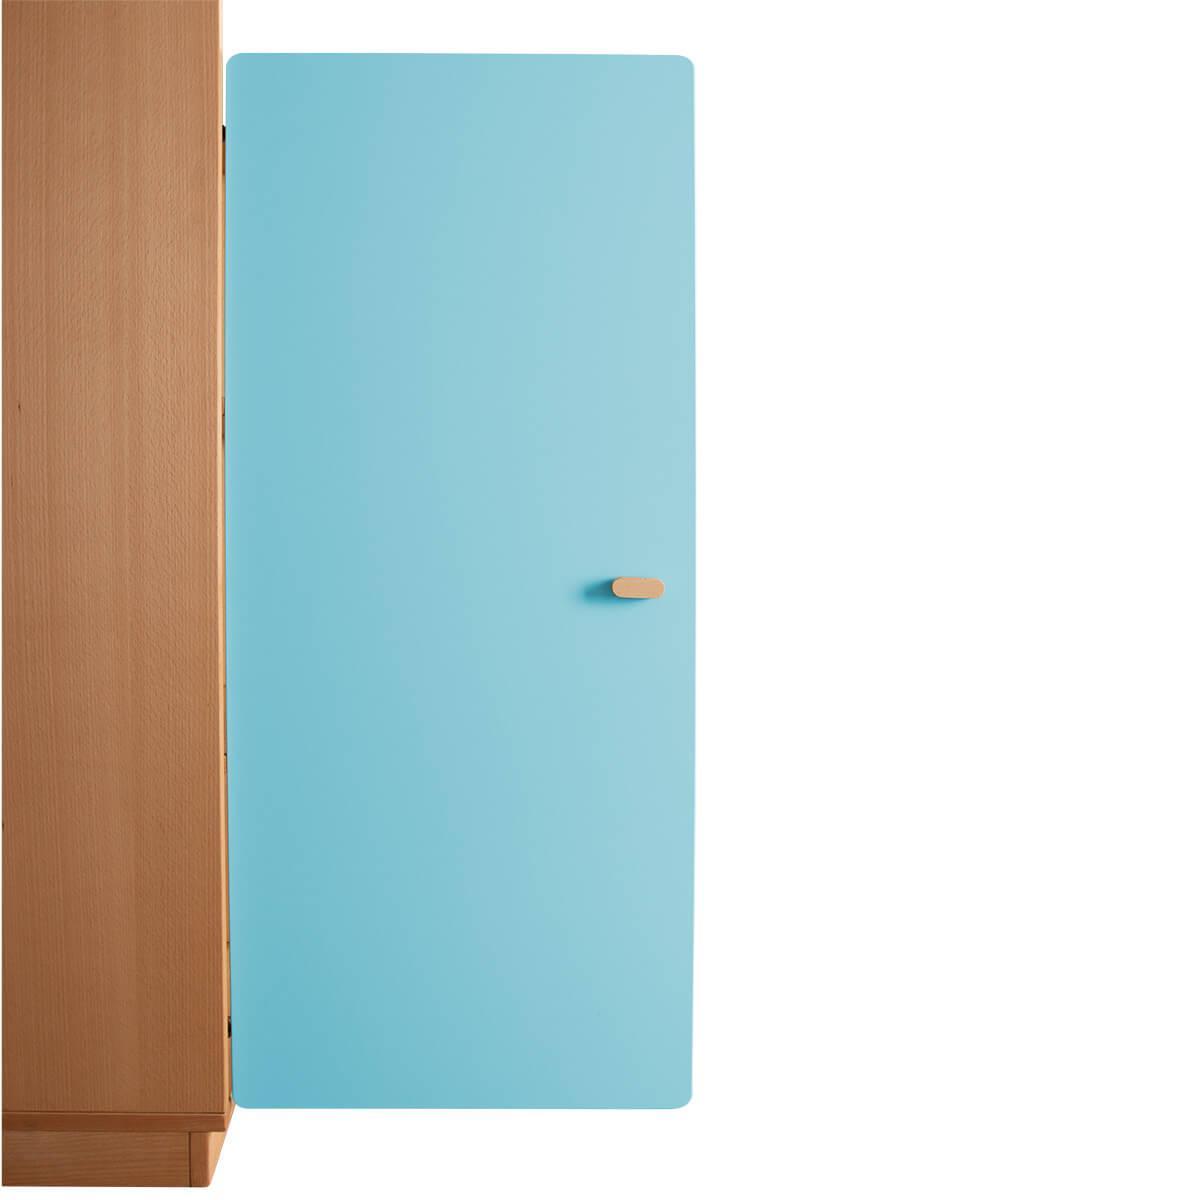 Schranktür 3/5 106cm-Griff DESTYLE de Breuyn MDF kristallblau-lackiert